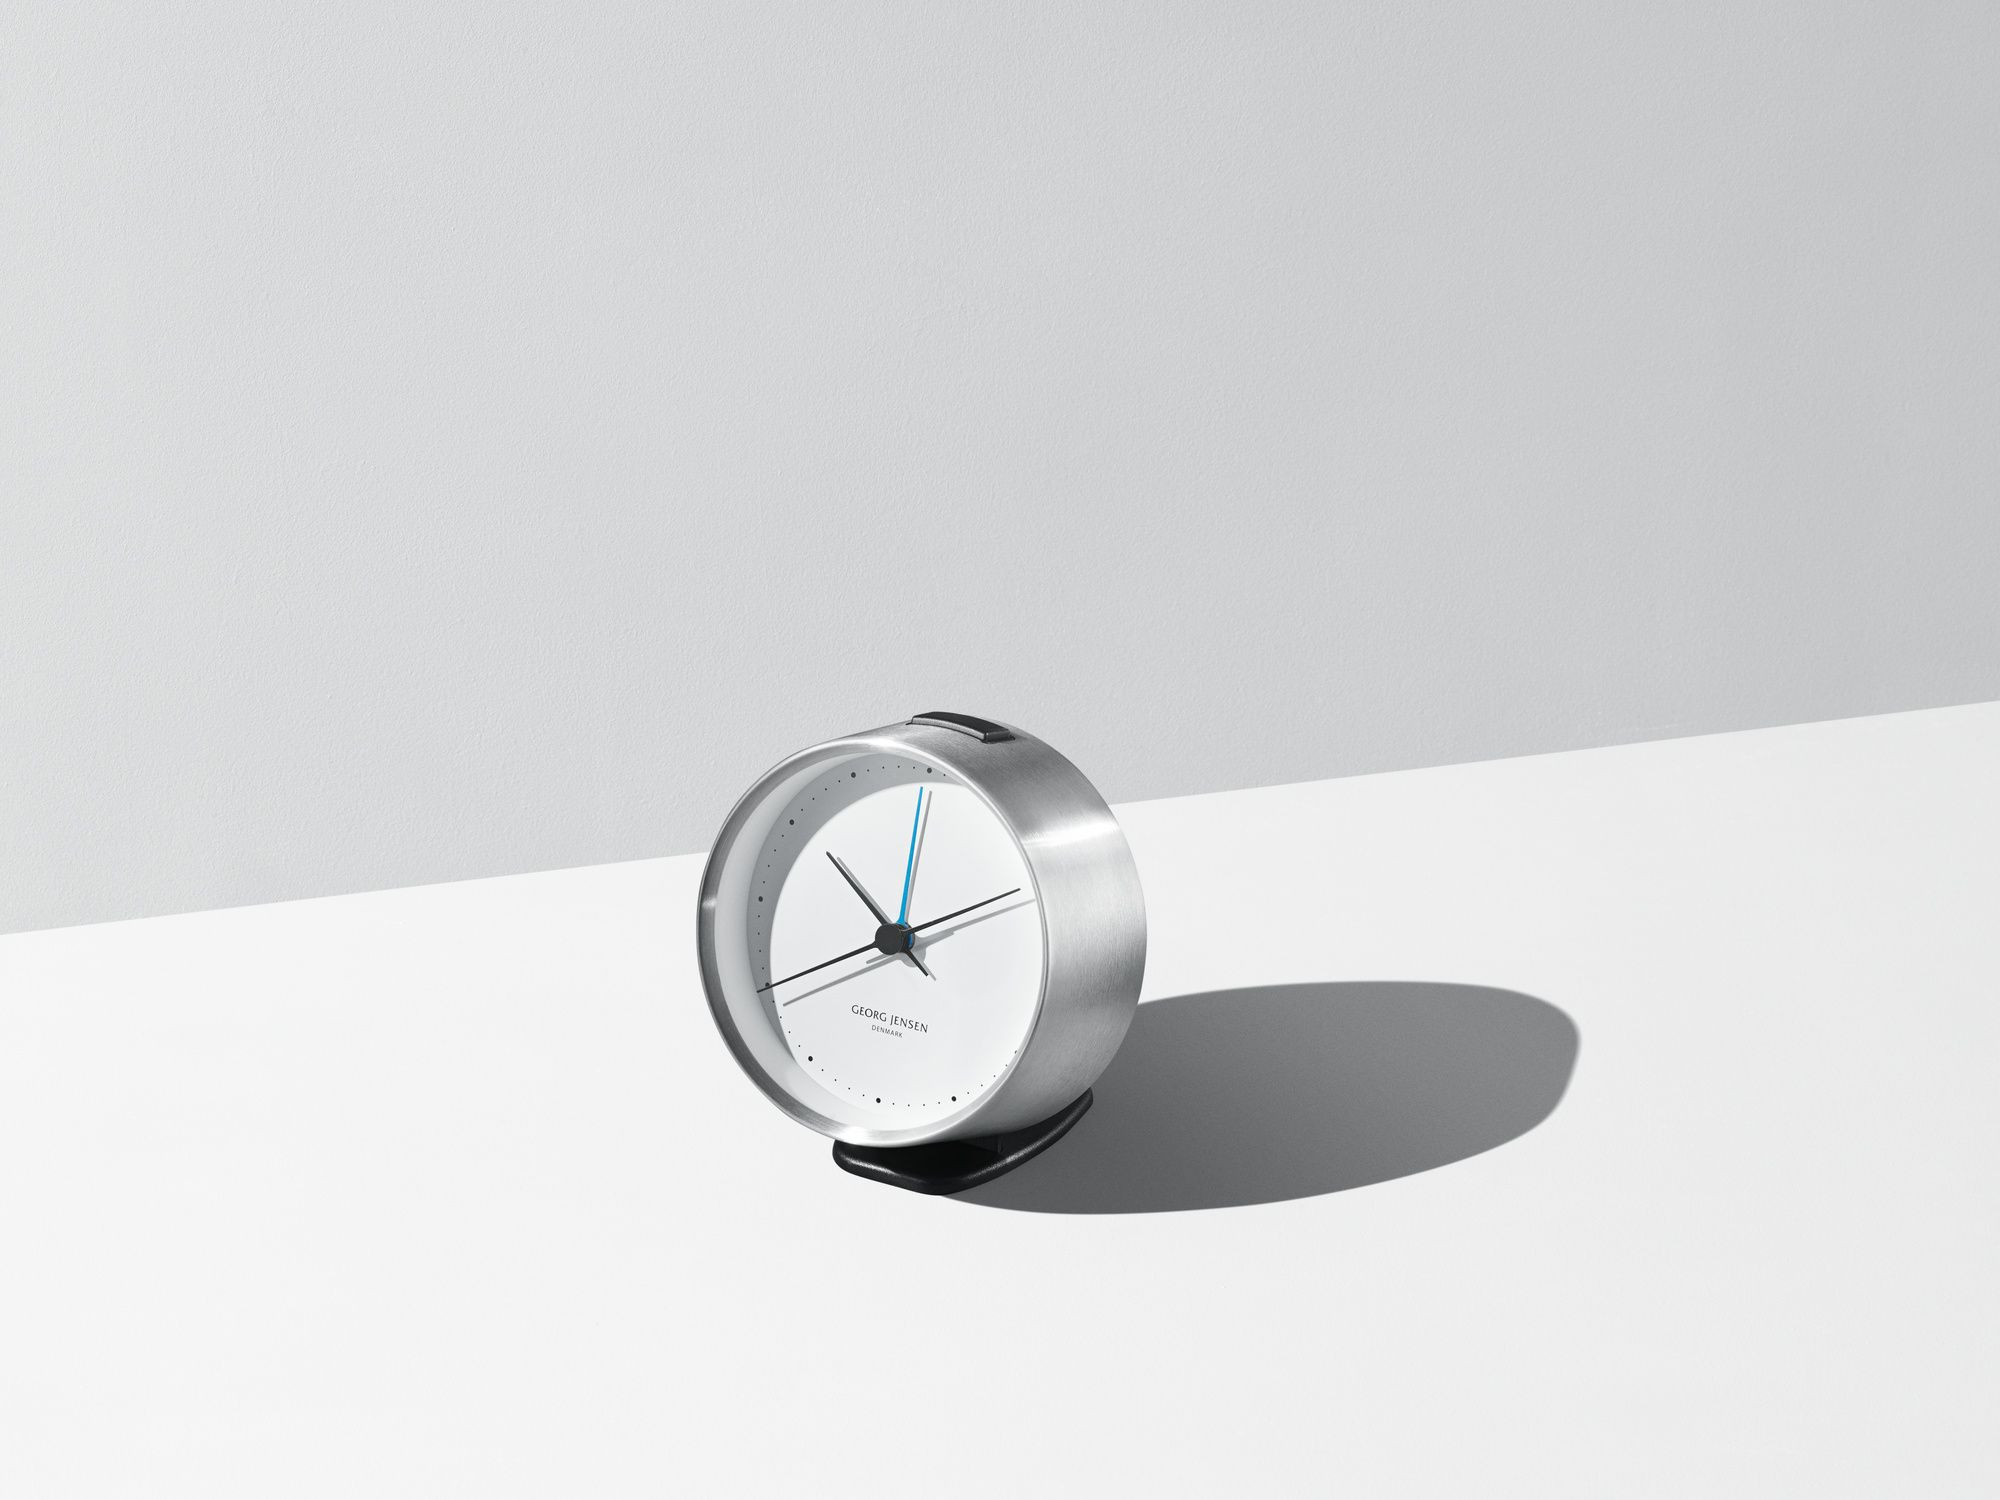 Hk Clock W Alarm Steel White 10 Cm Georg Jensen Clock Wall Clock Beautiful Gift Wrapping